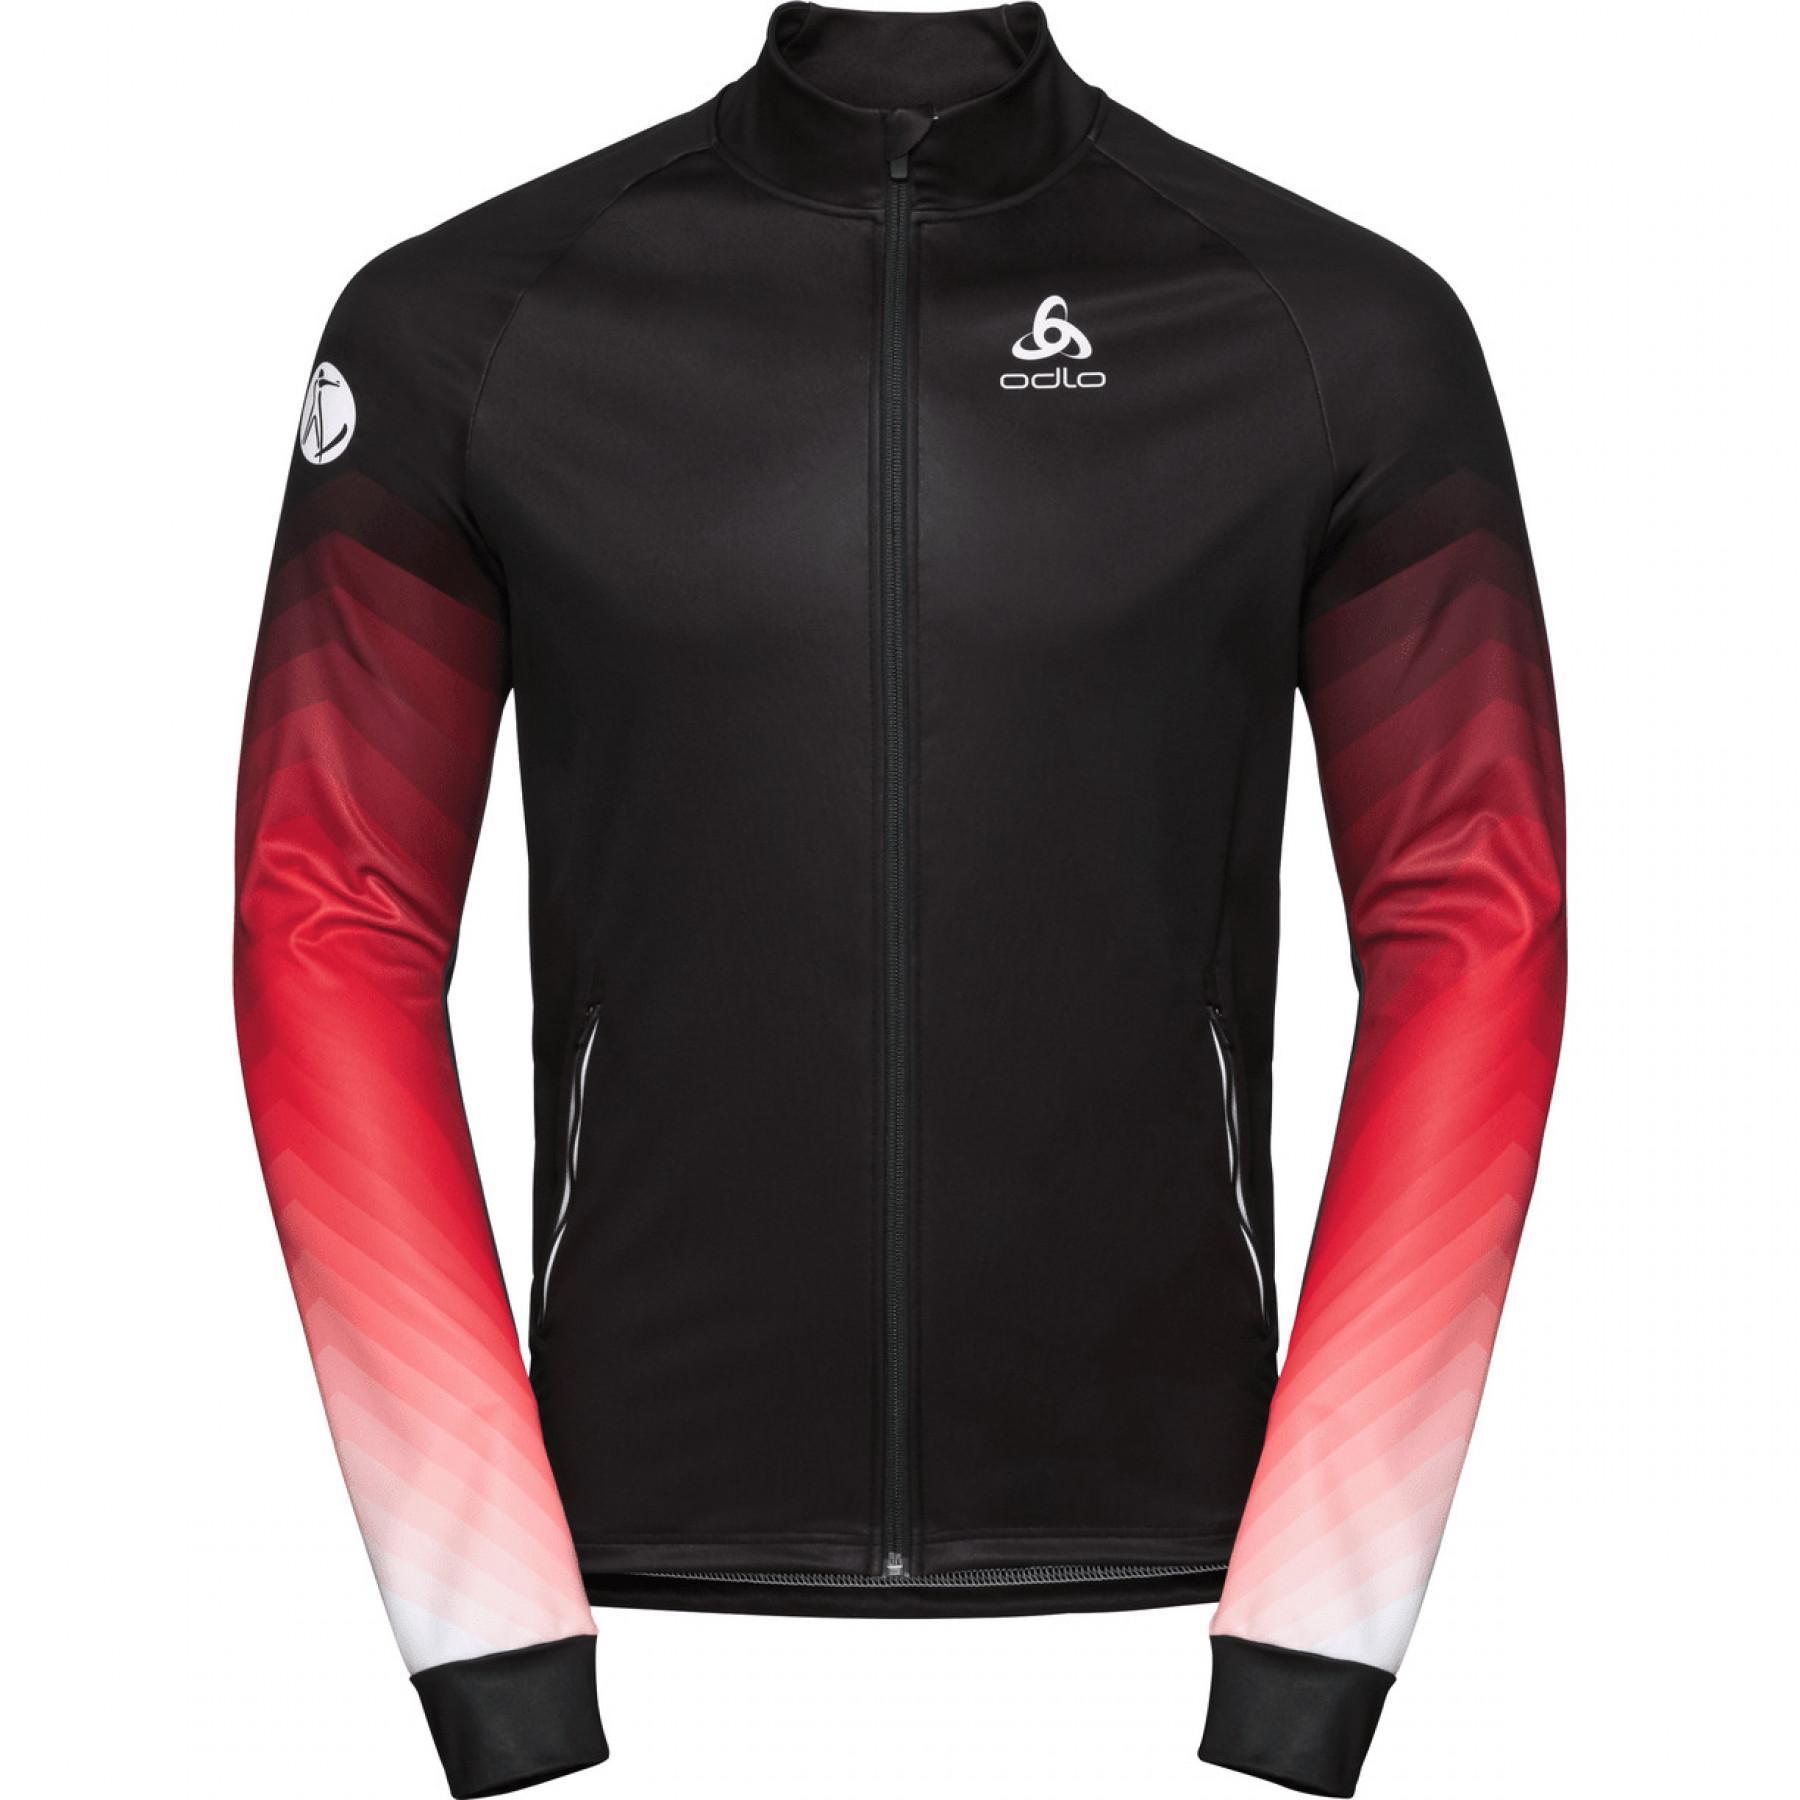 Odlo Performance Warm UP Jacket